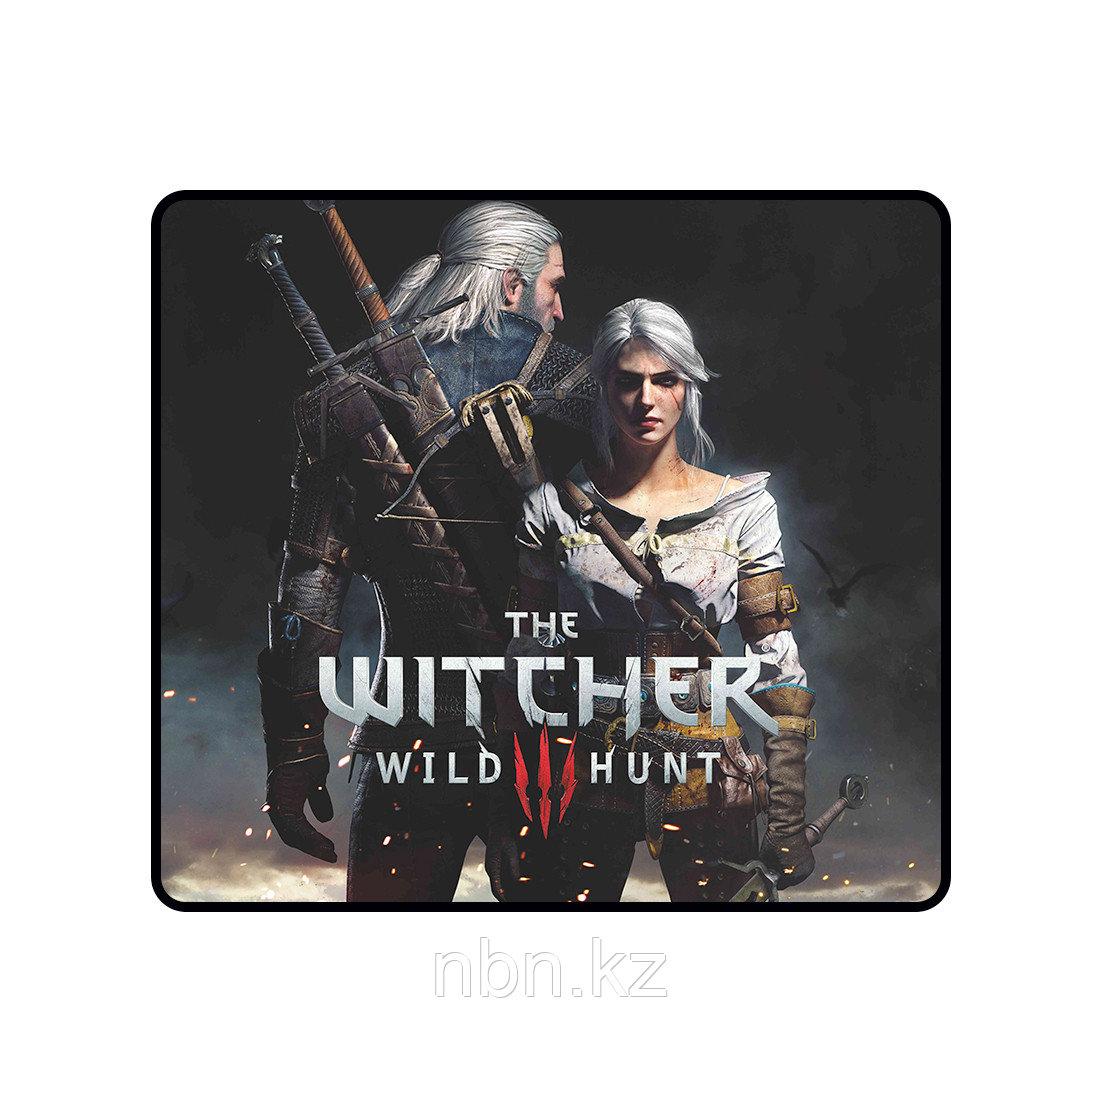 Коврик для компьютерной мыши X-game The witcher 3: Wild hunt